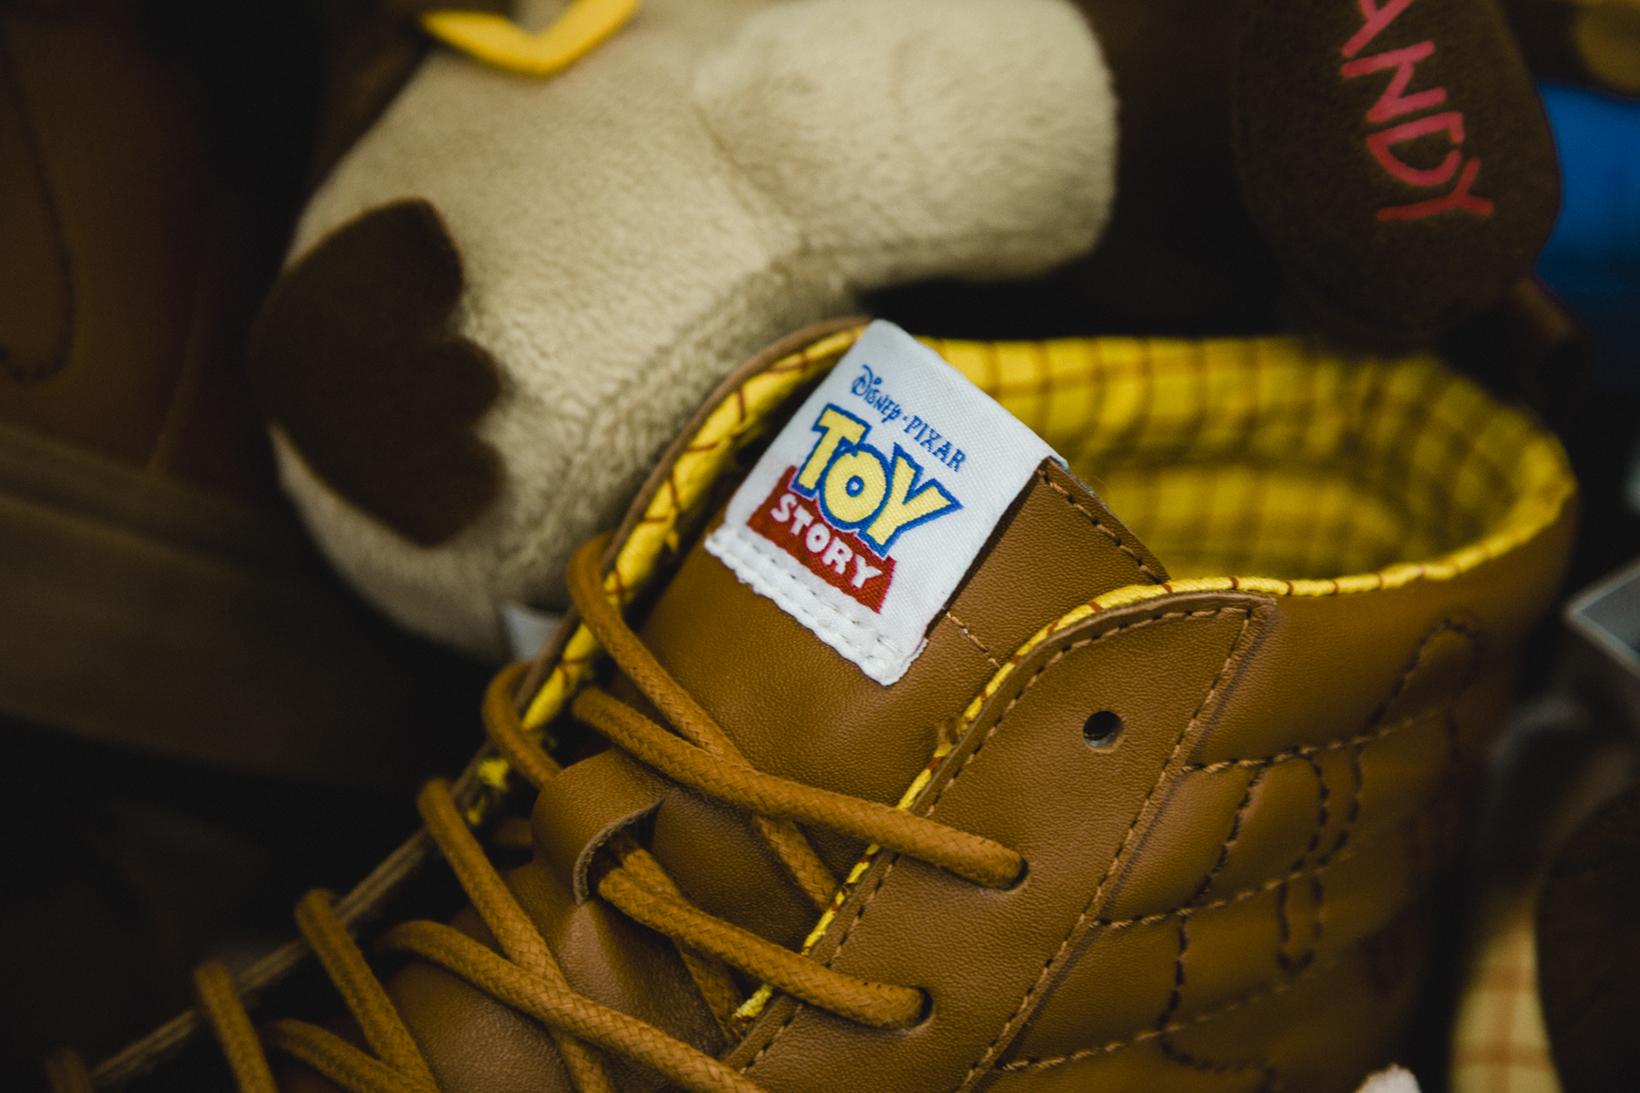 Toy Story Vans Sneakers Woody Buzz Lightyear Disney - 1765030